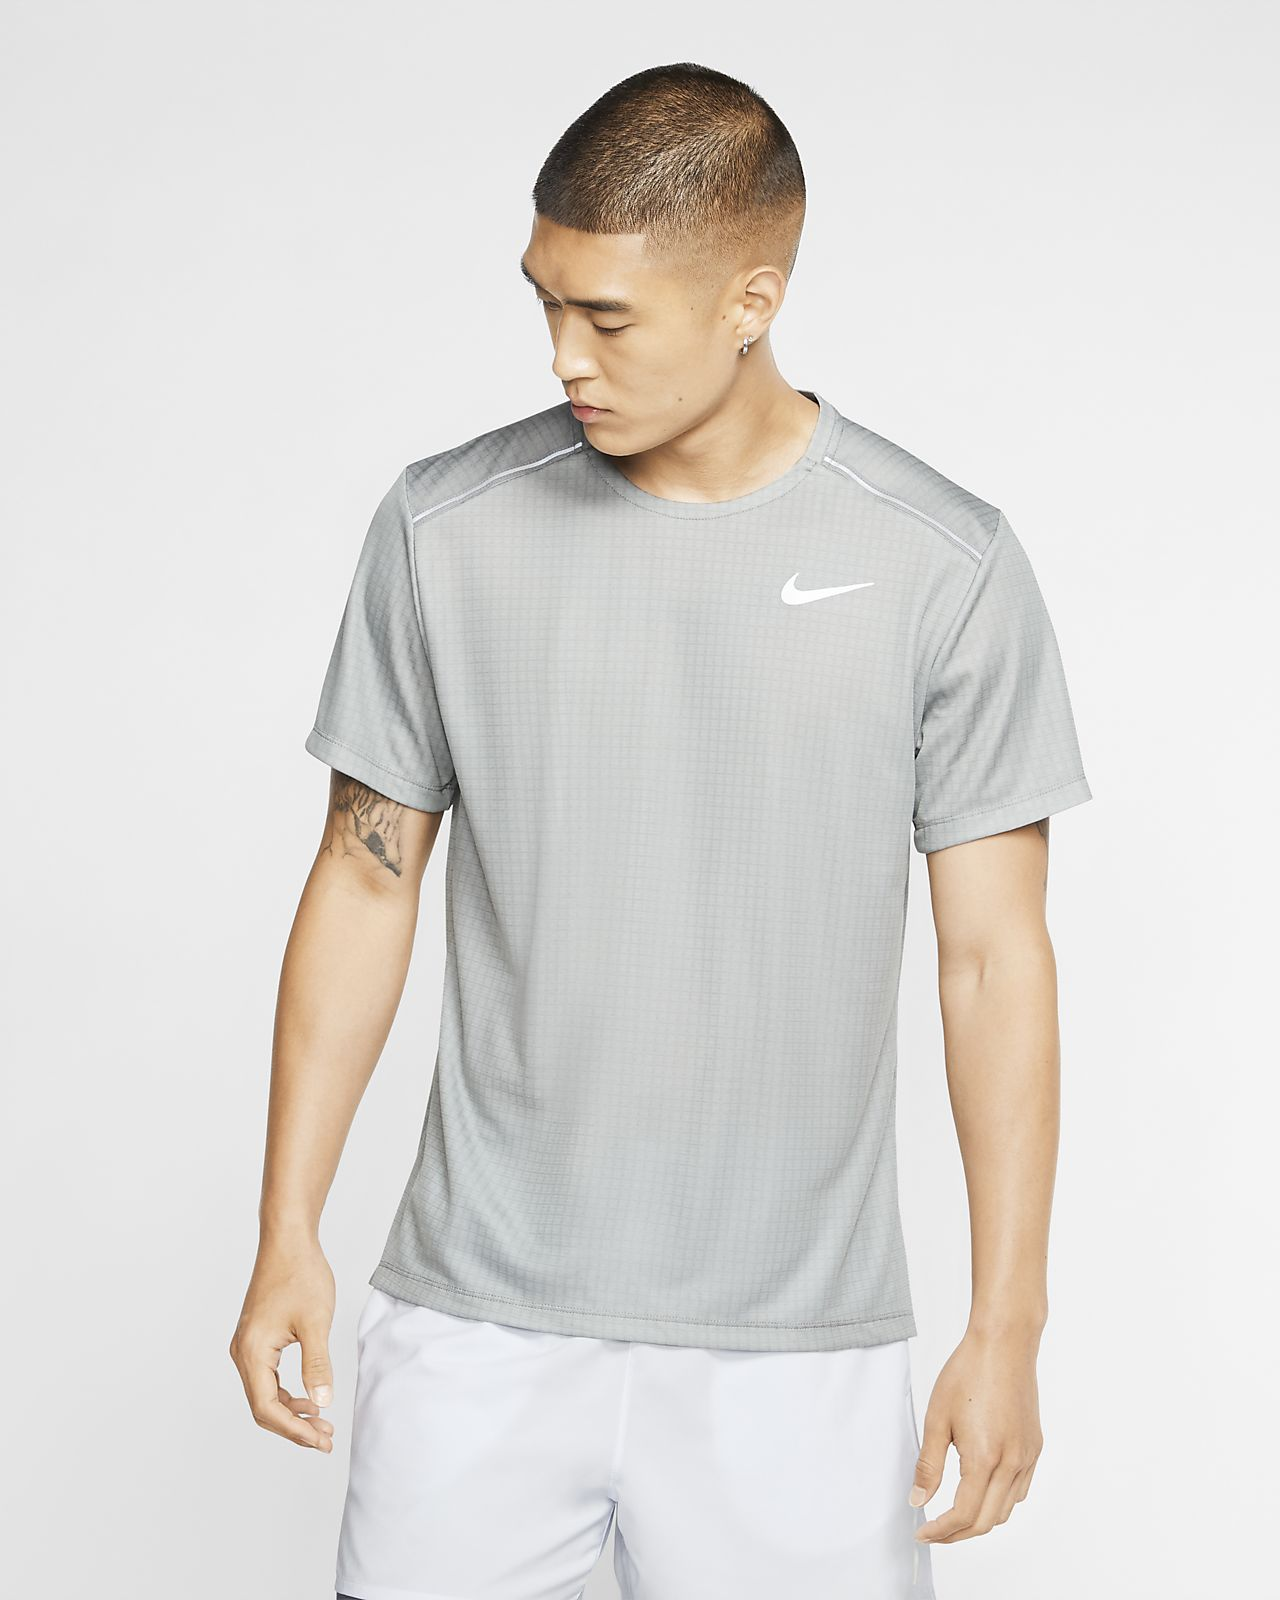 Parte superior de running de manga corta para hombre Nike Miler